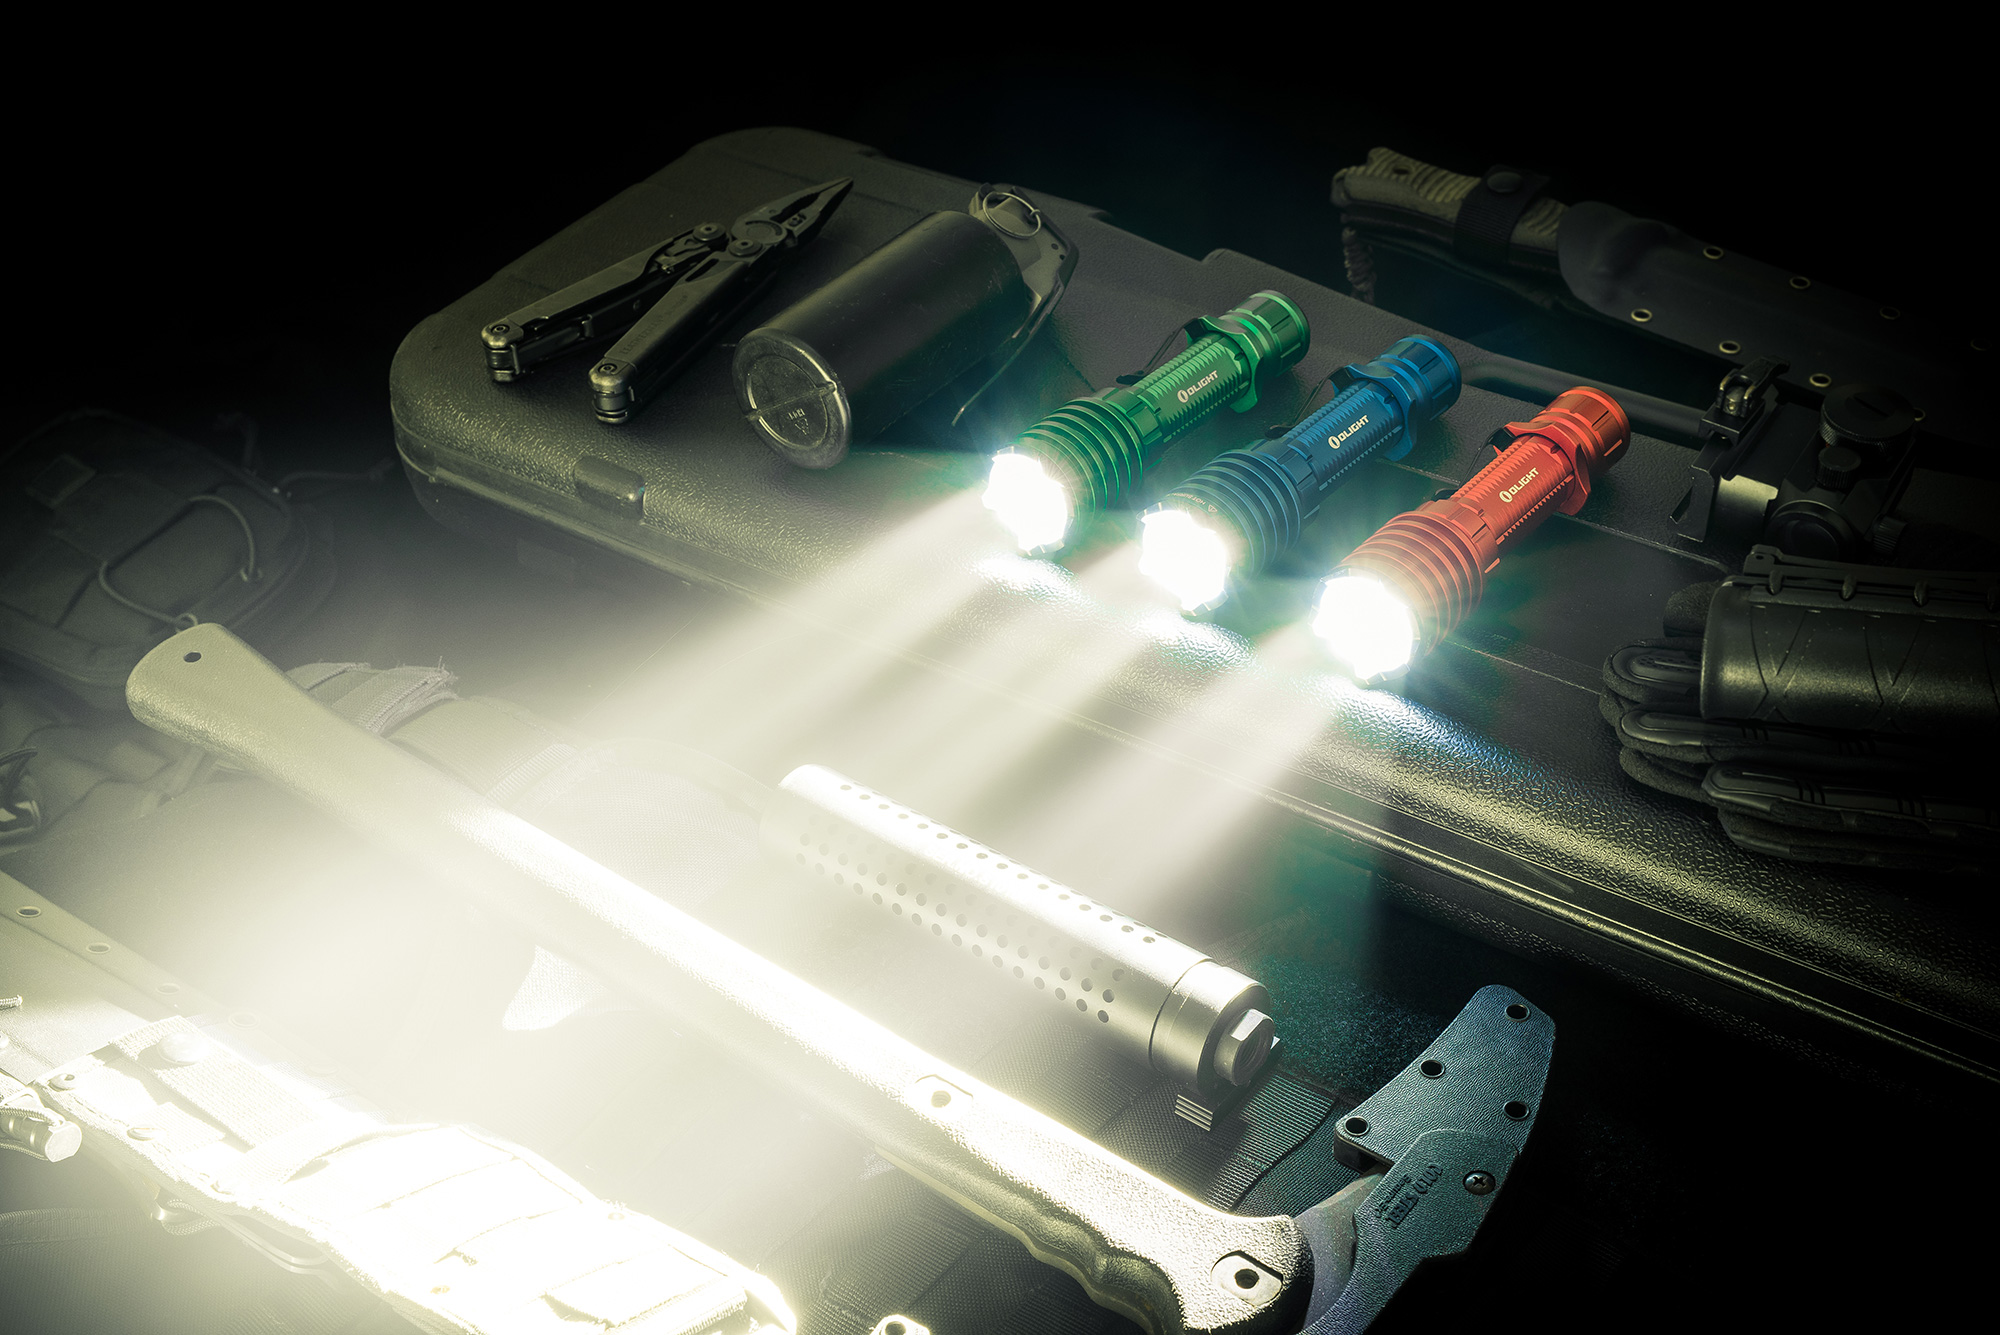 Warrior X Pro—Olight Powerful tactical flashlight